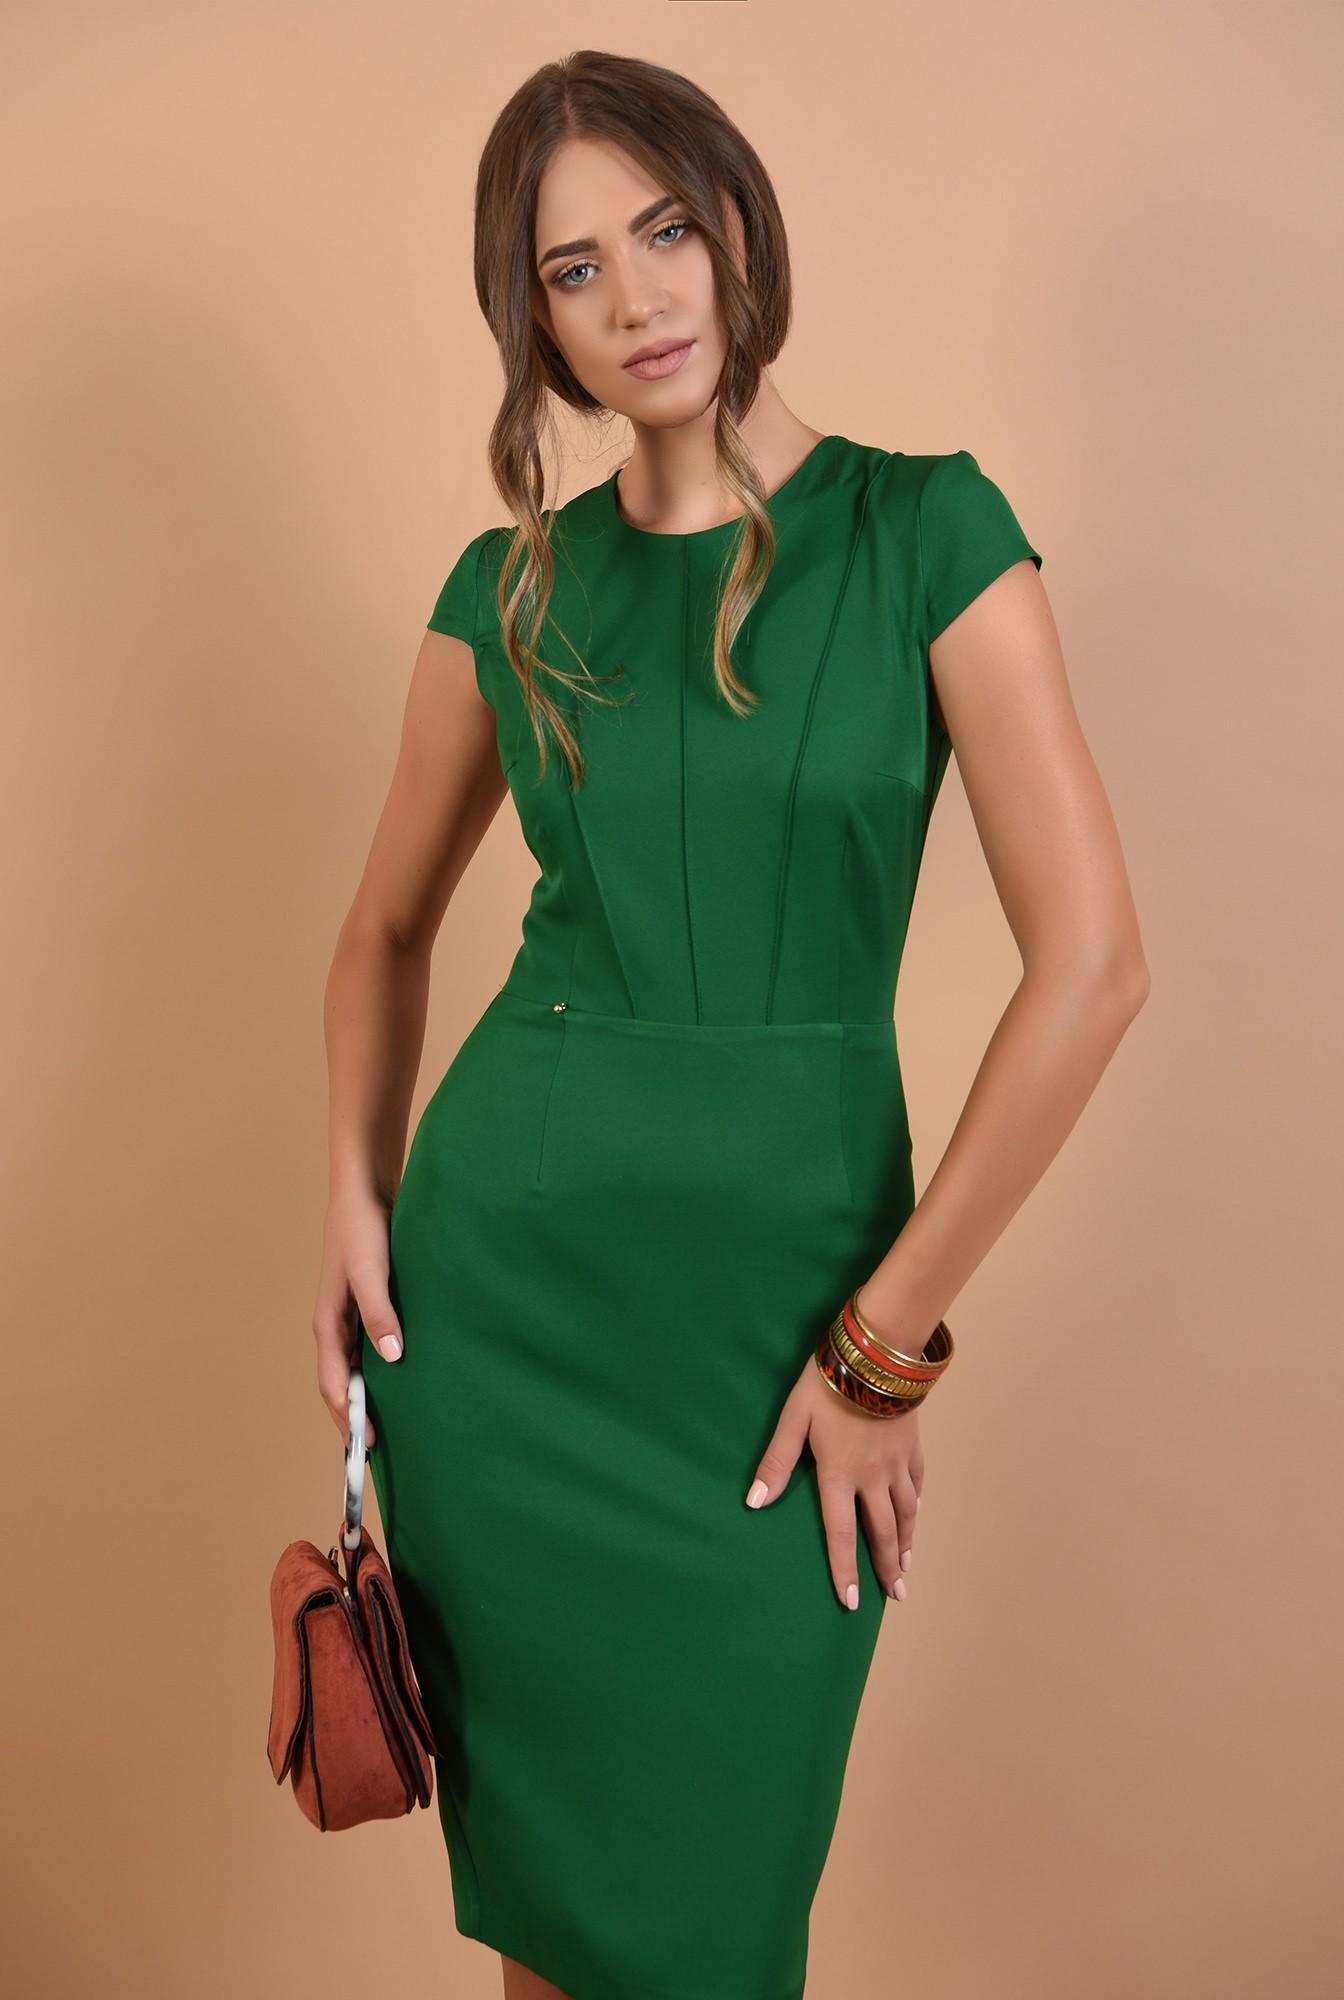 0 - rochie verde, office, conica, midi, cu maneci capac, cusaturi decorative, Poema